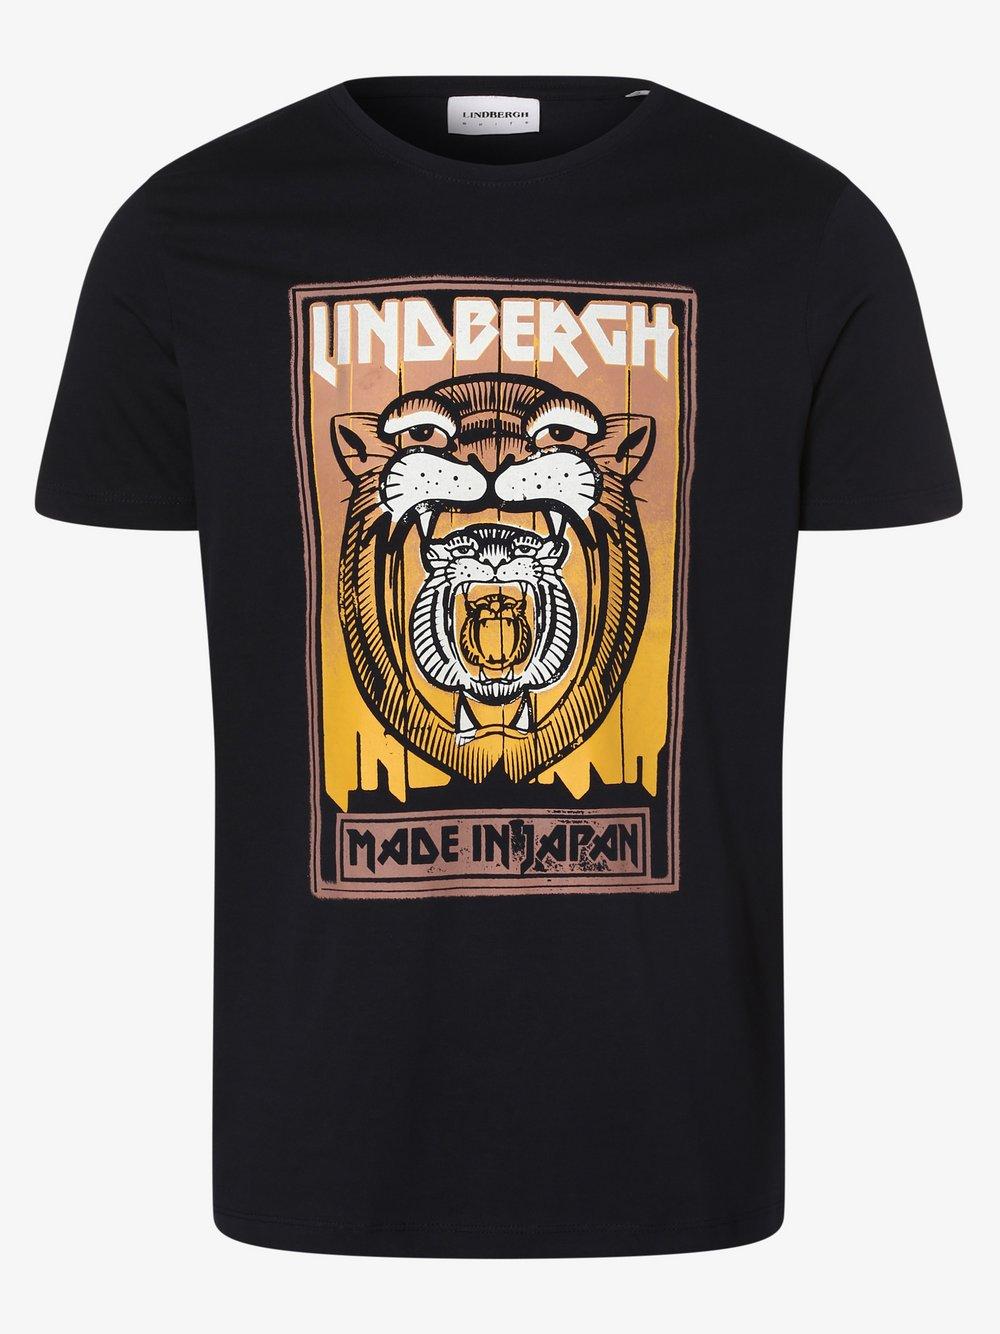 Lindbergh – T-shirt męski, niebieski Van Graaf 477588-0001-09900